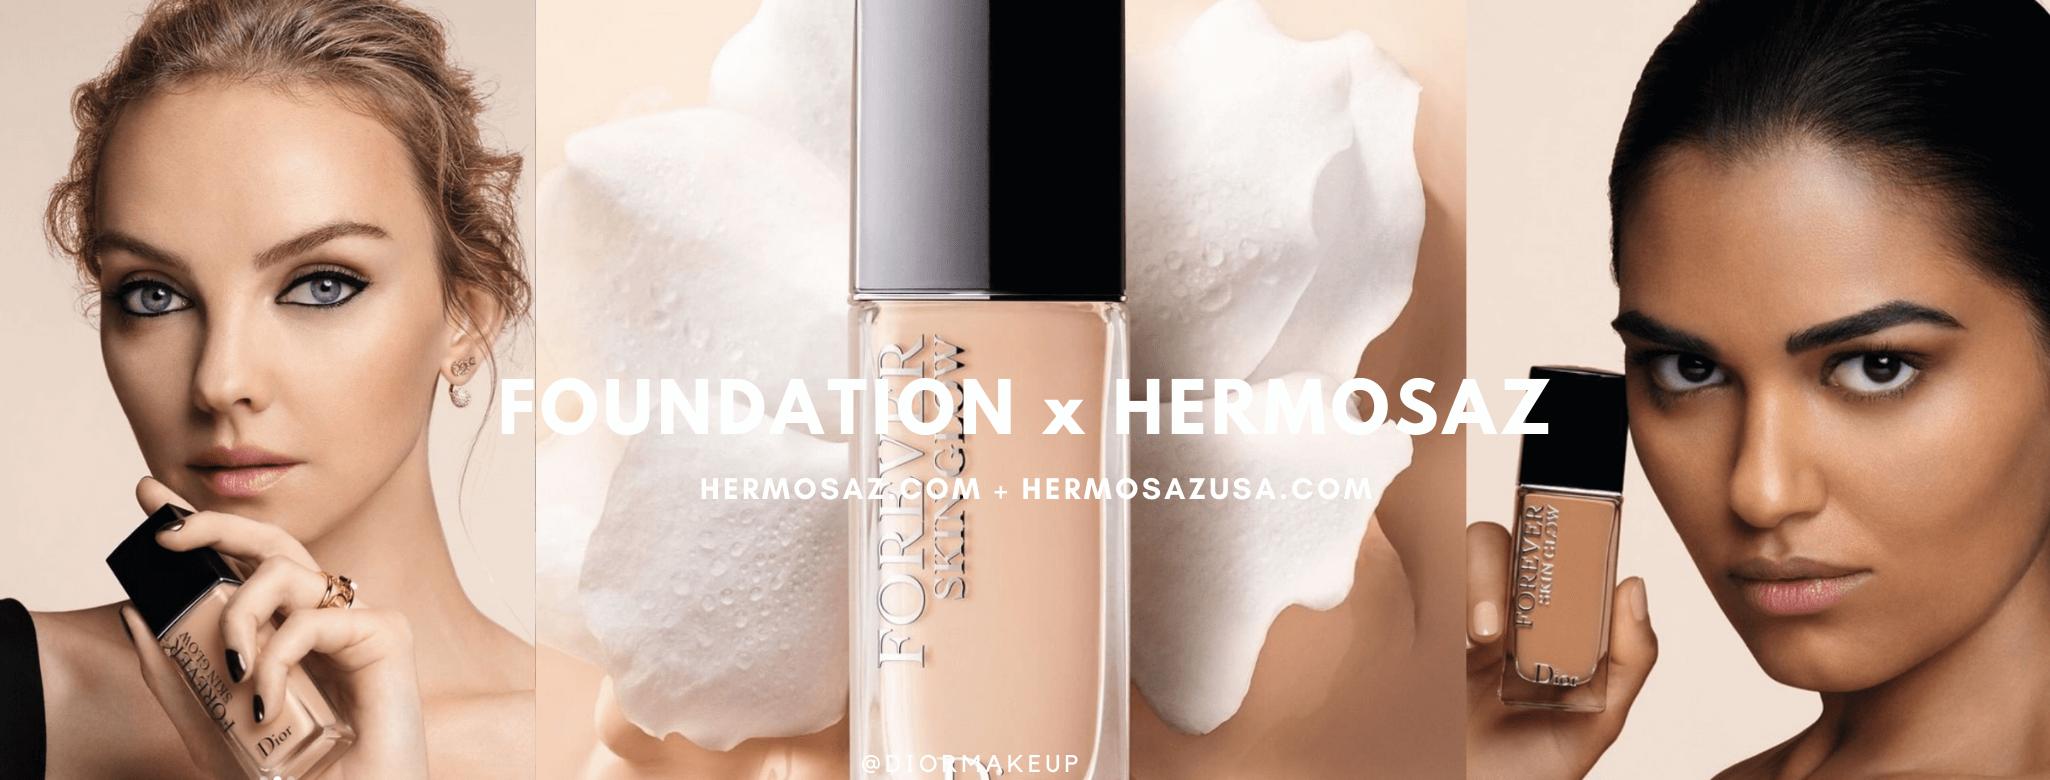 Foundation x Hermosaz